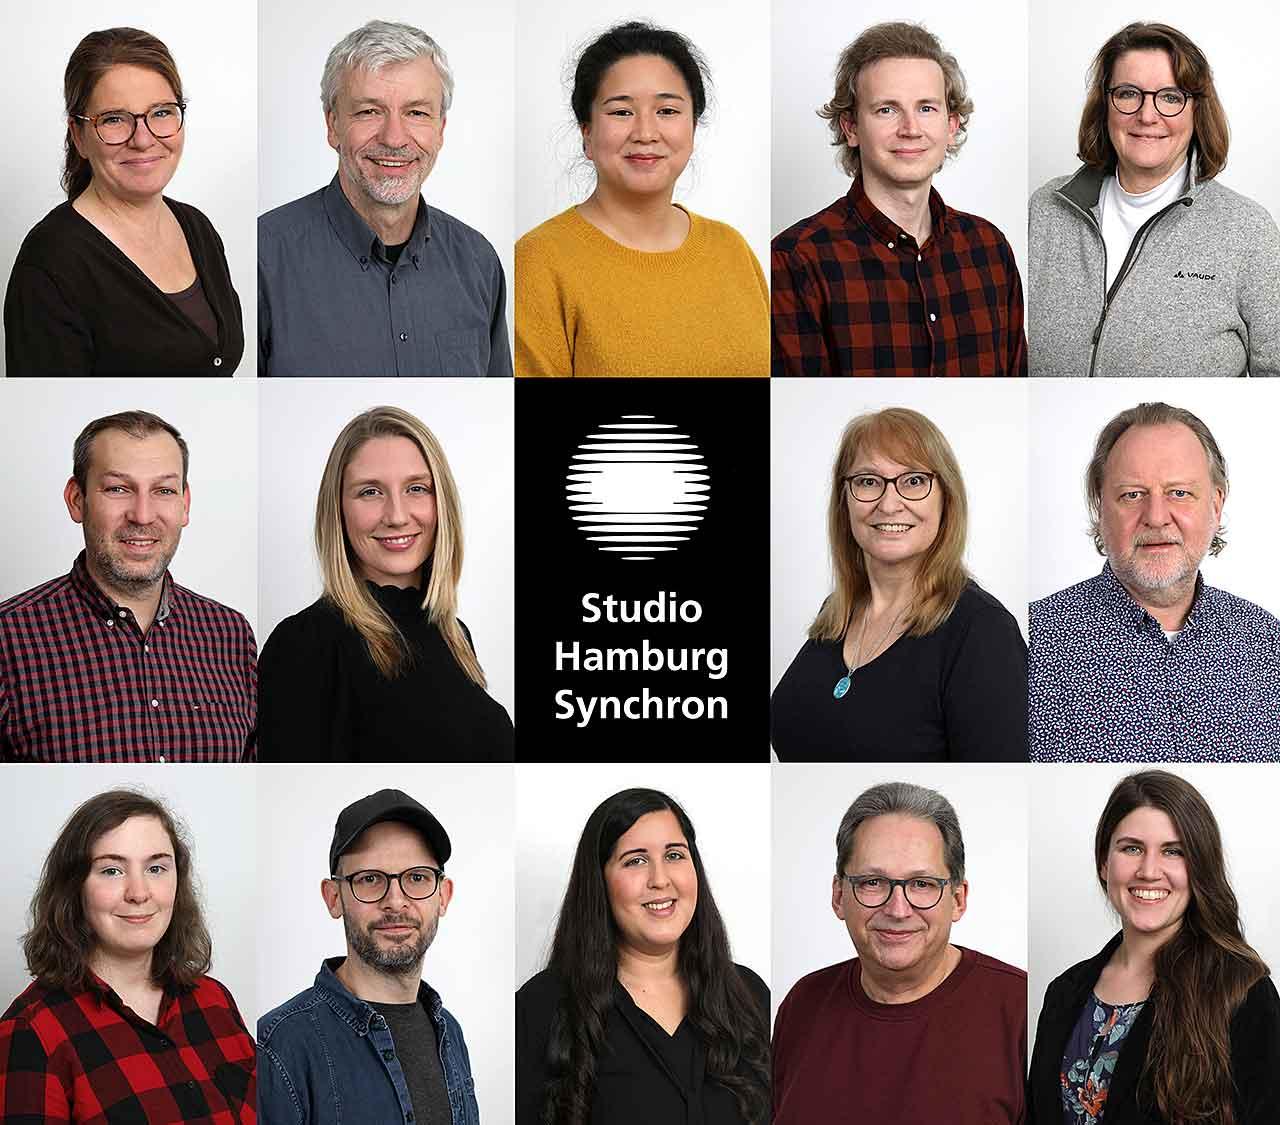 Studio Hamburg Synchron